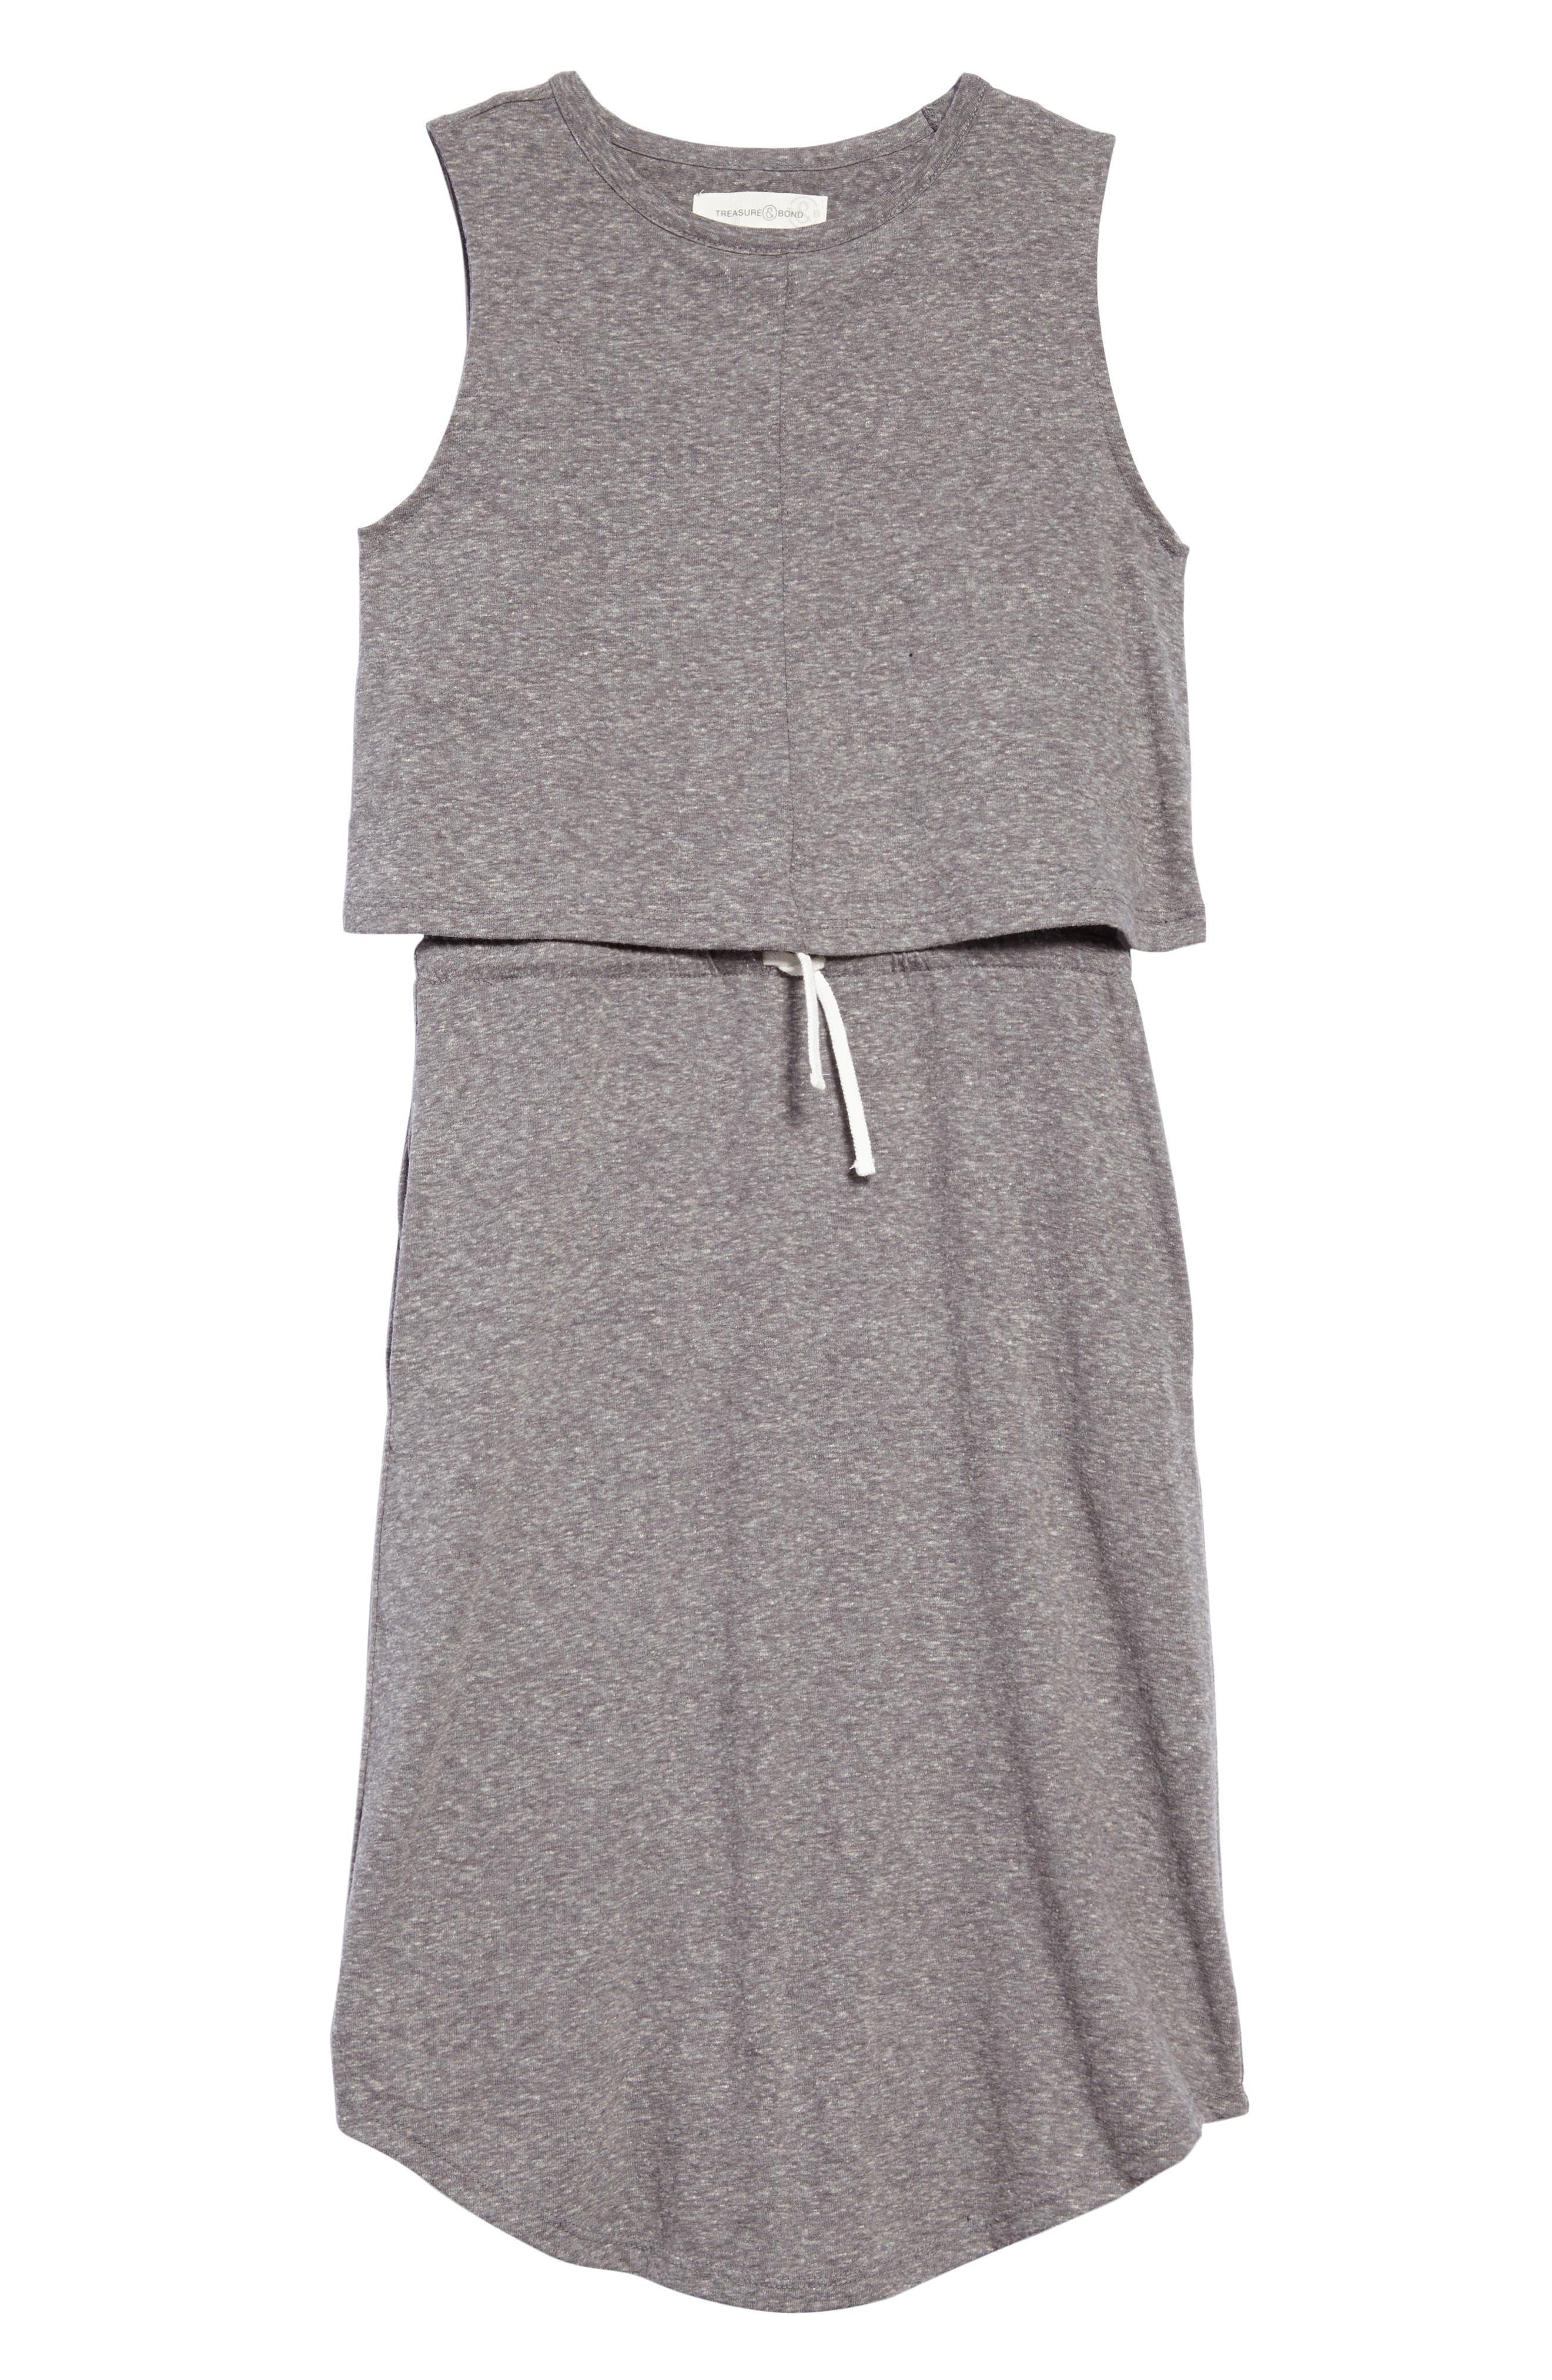 Knit Popover Dress,                             Main thumbnail 1, color,                             Grey Medium Heather